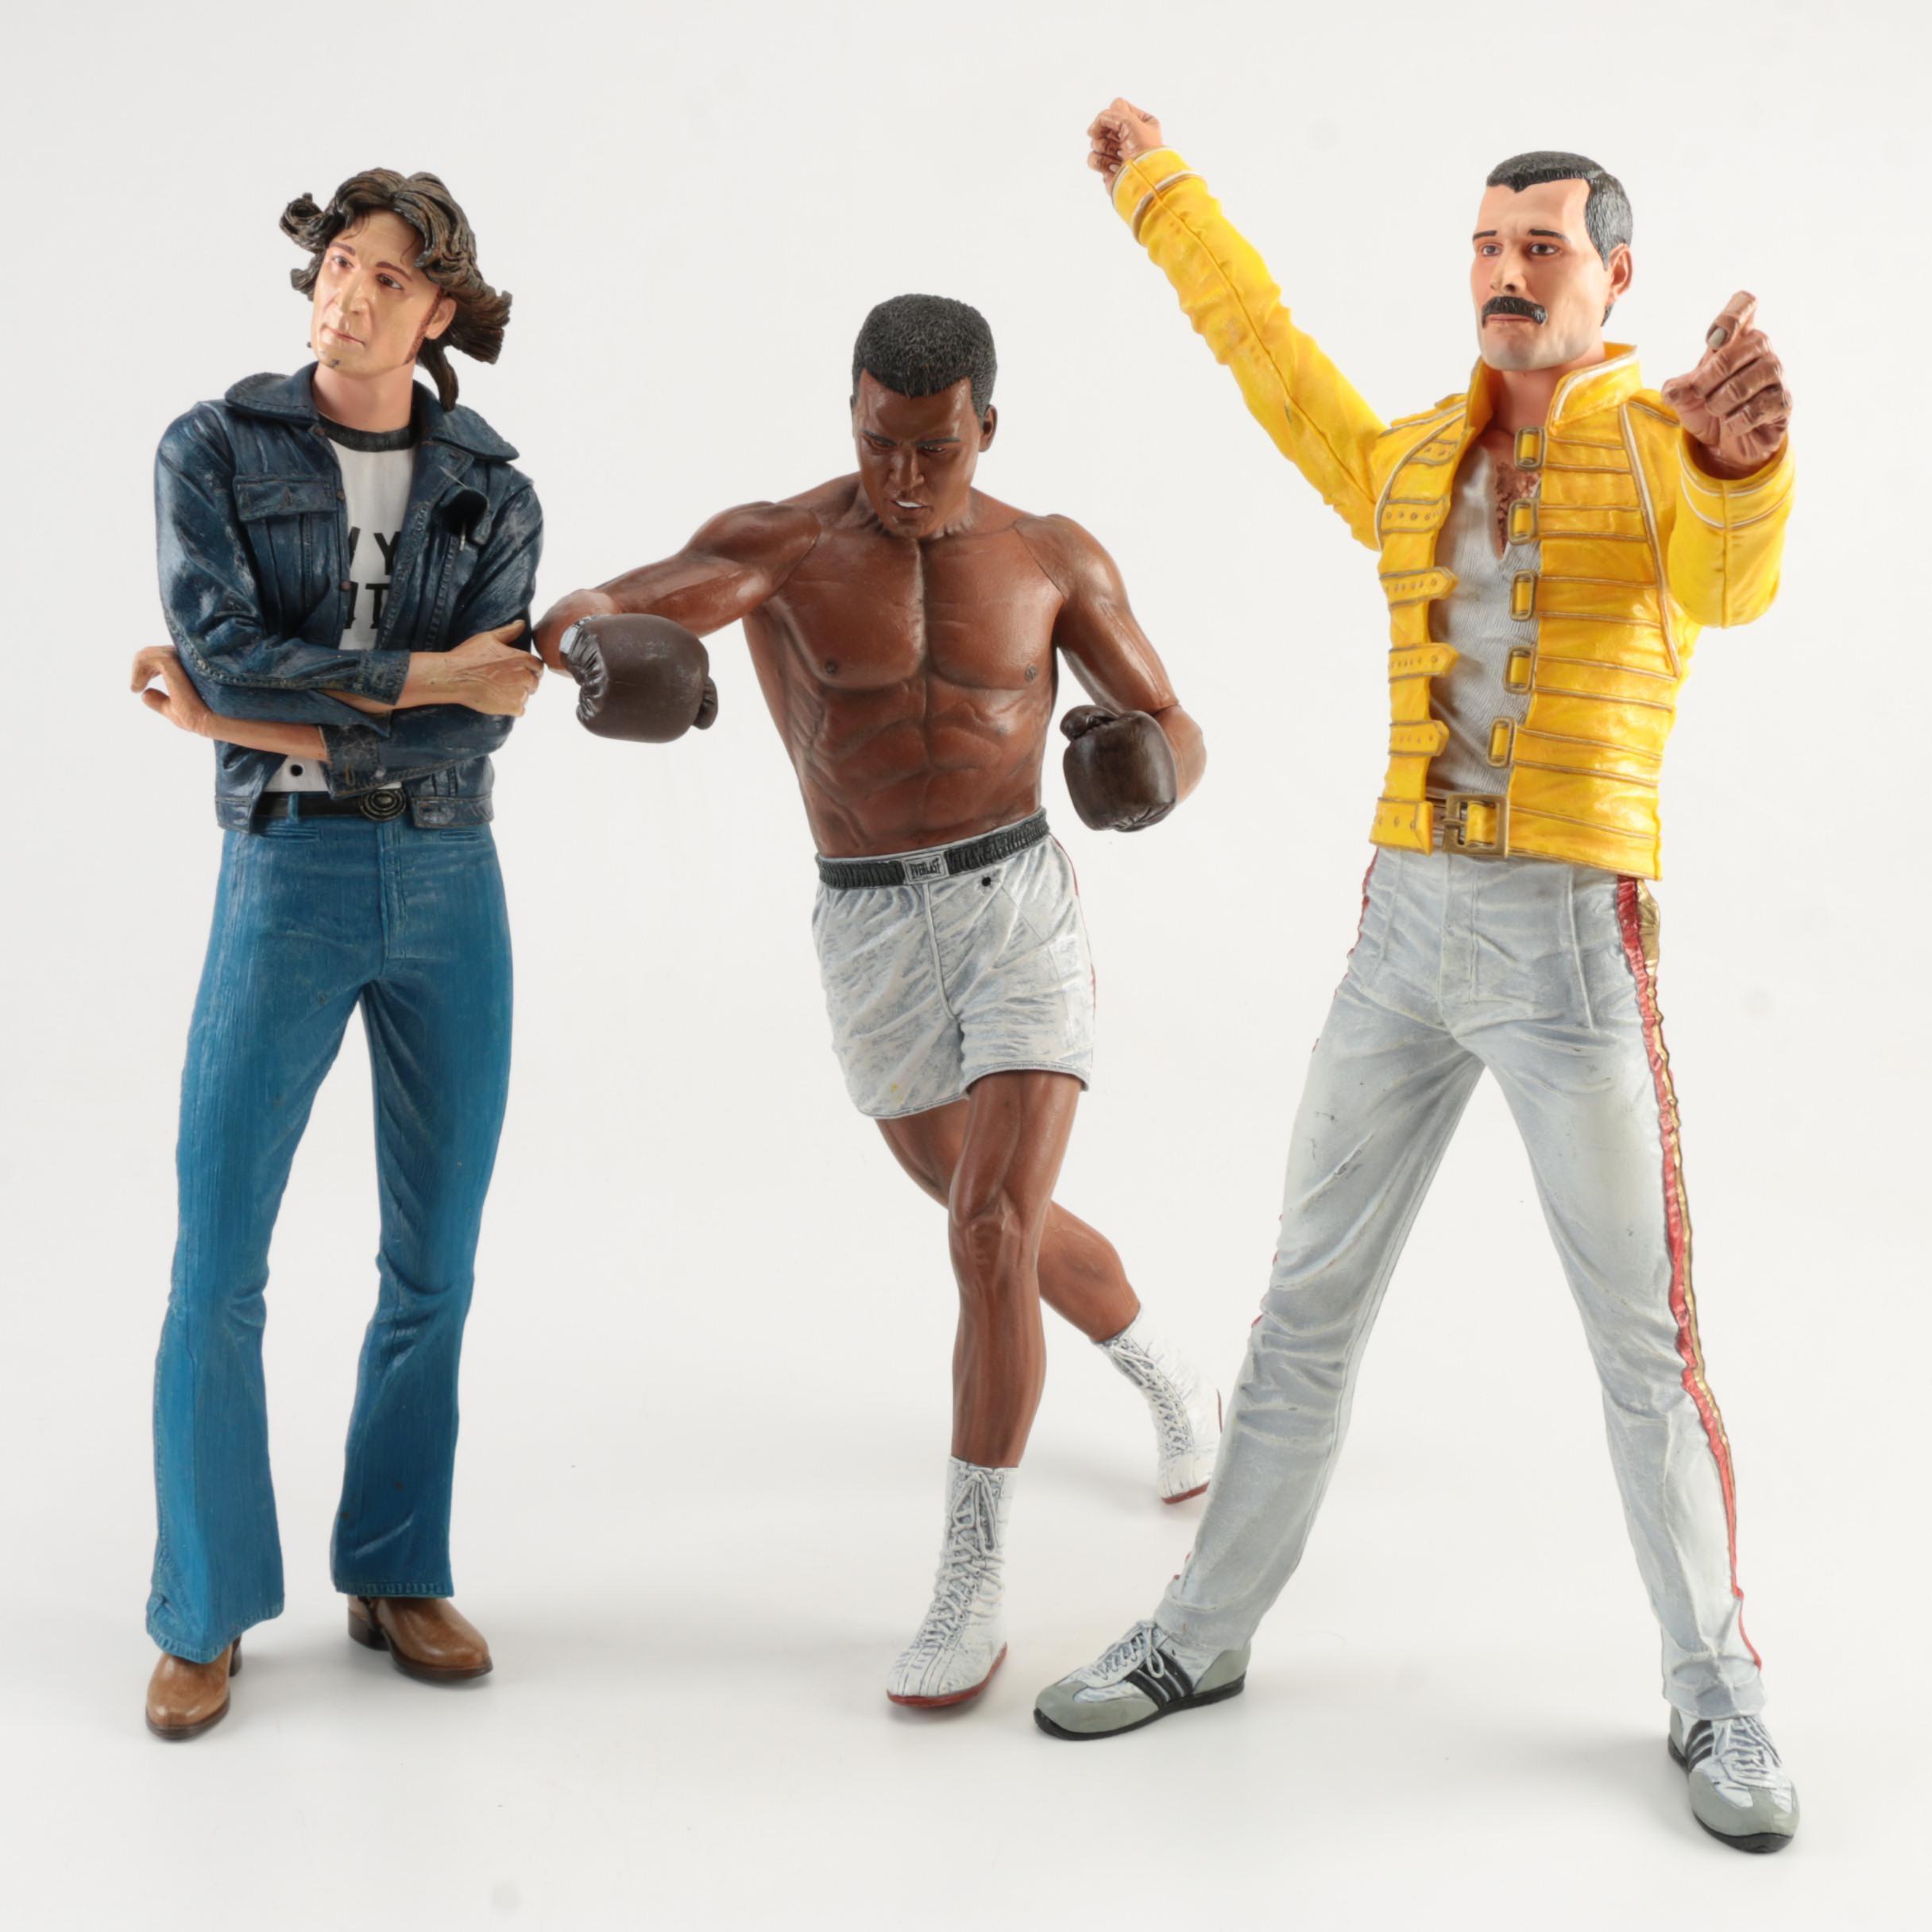 Plastic Dolls of Muhammad Ali, Freddie Mercury, and John Lennon